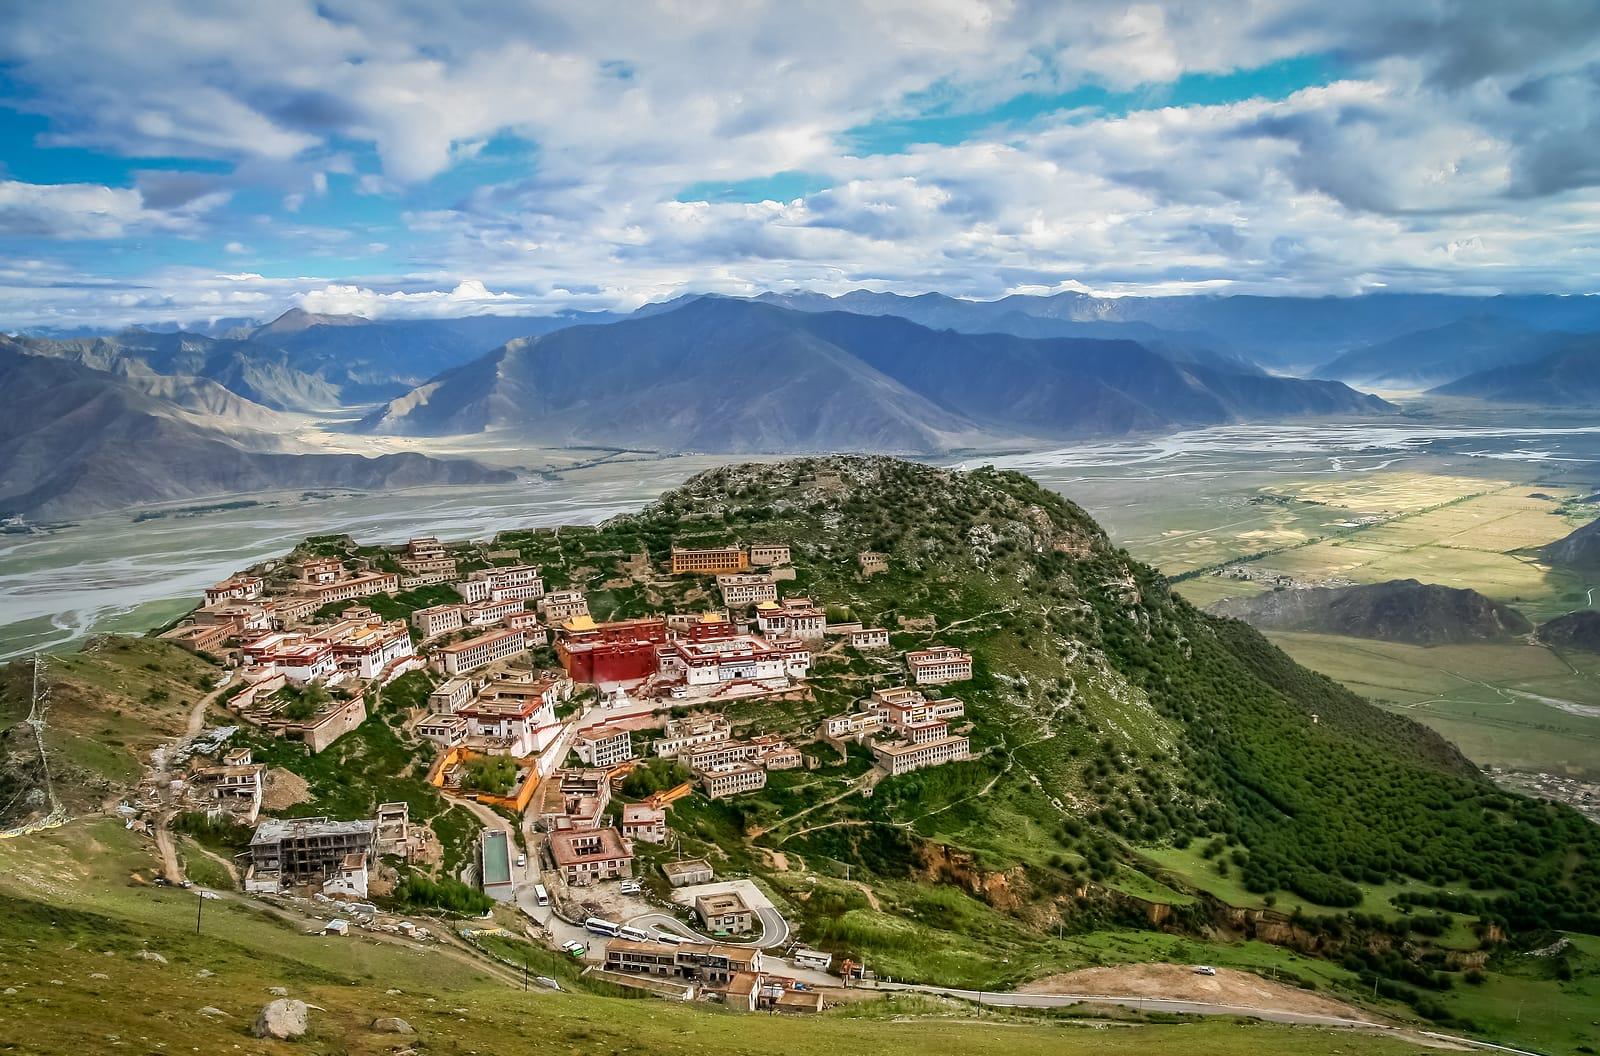 Ganden Monastery near Lhasa, Tibet